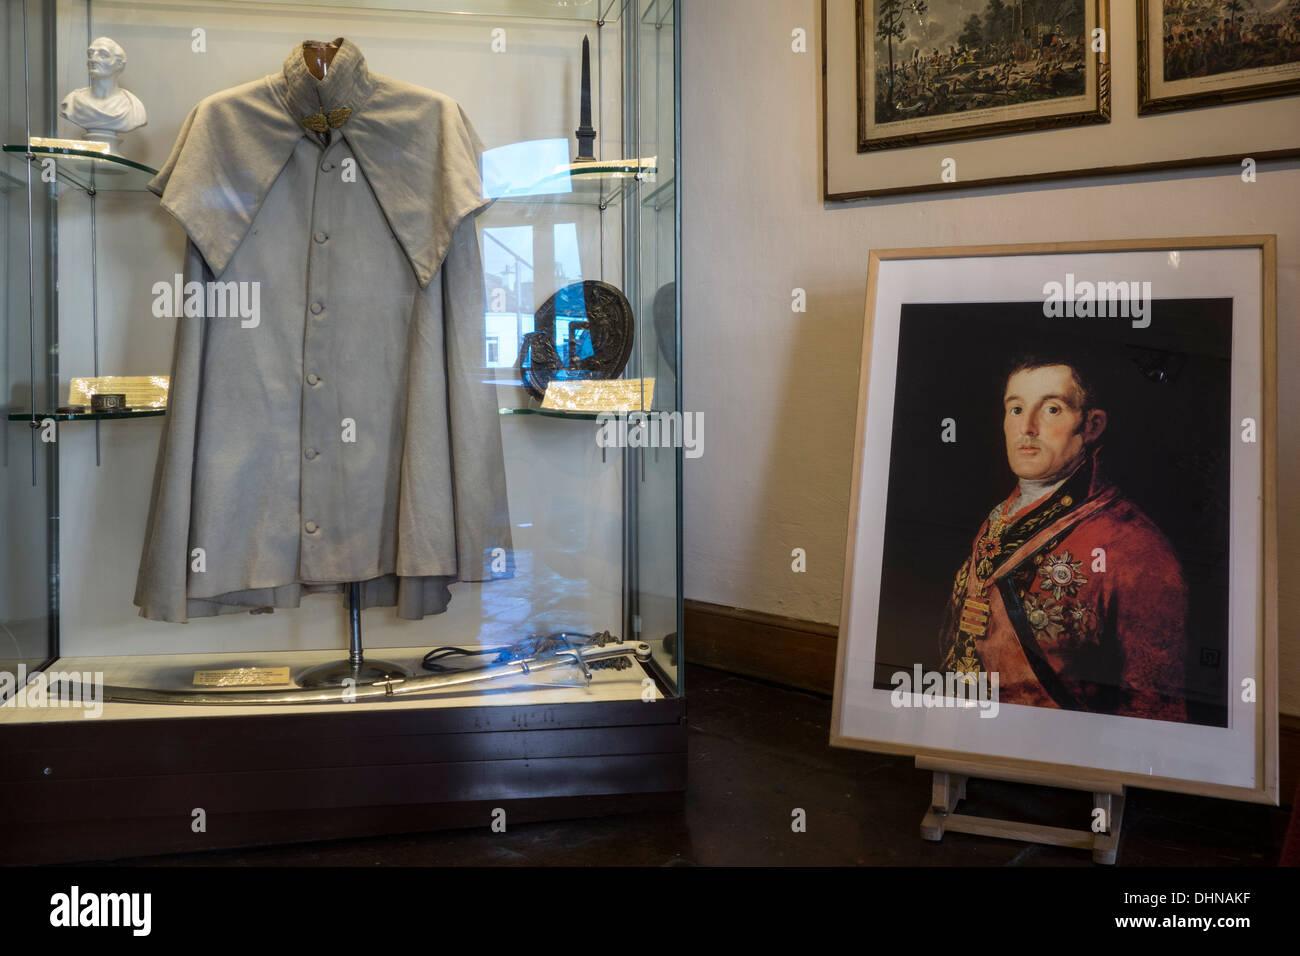 Portrait painting and cloak of Wellesley, commander during the Napoleonic war, Battle of Waterloo, Wellington Museum, Belgium - Stock Image